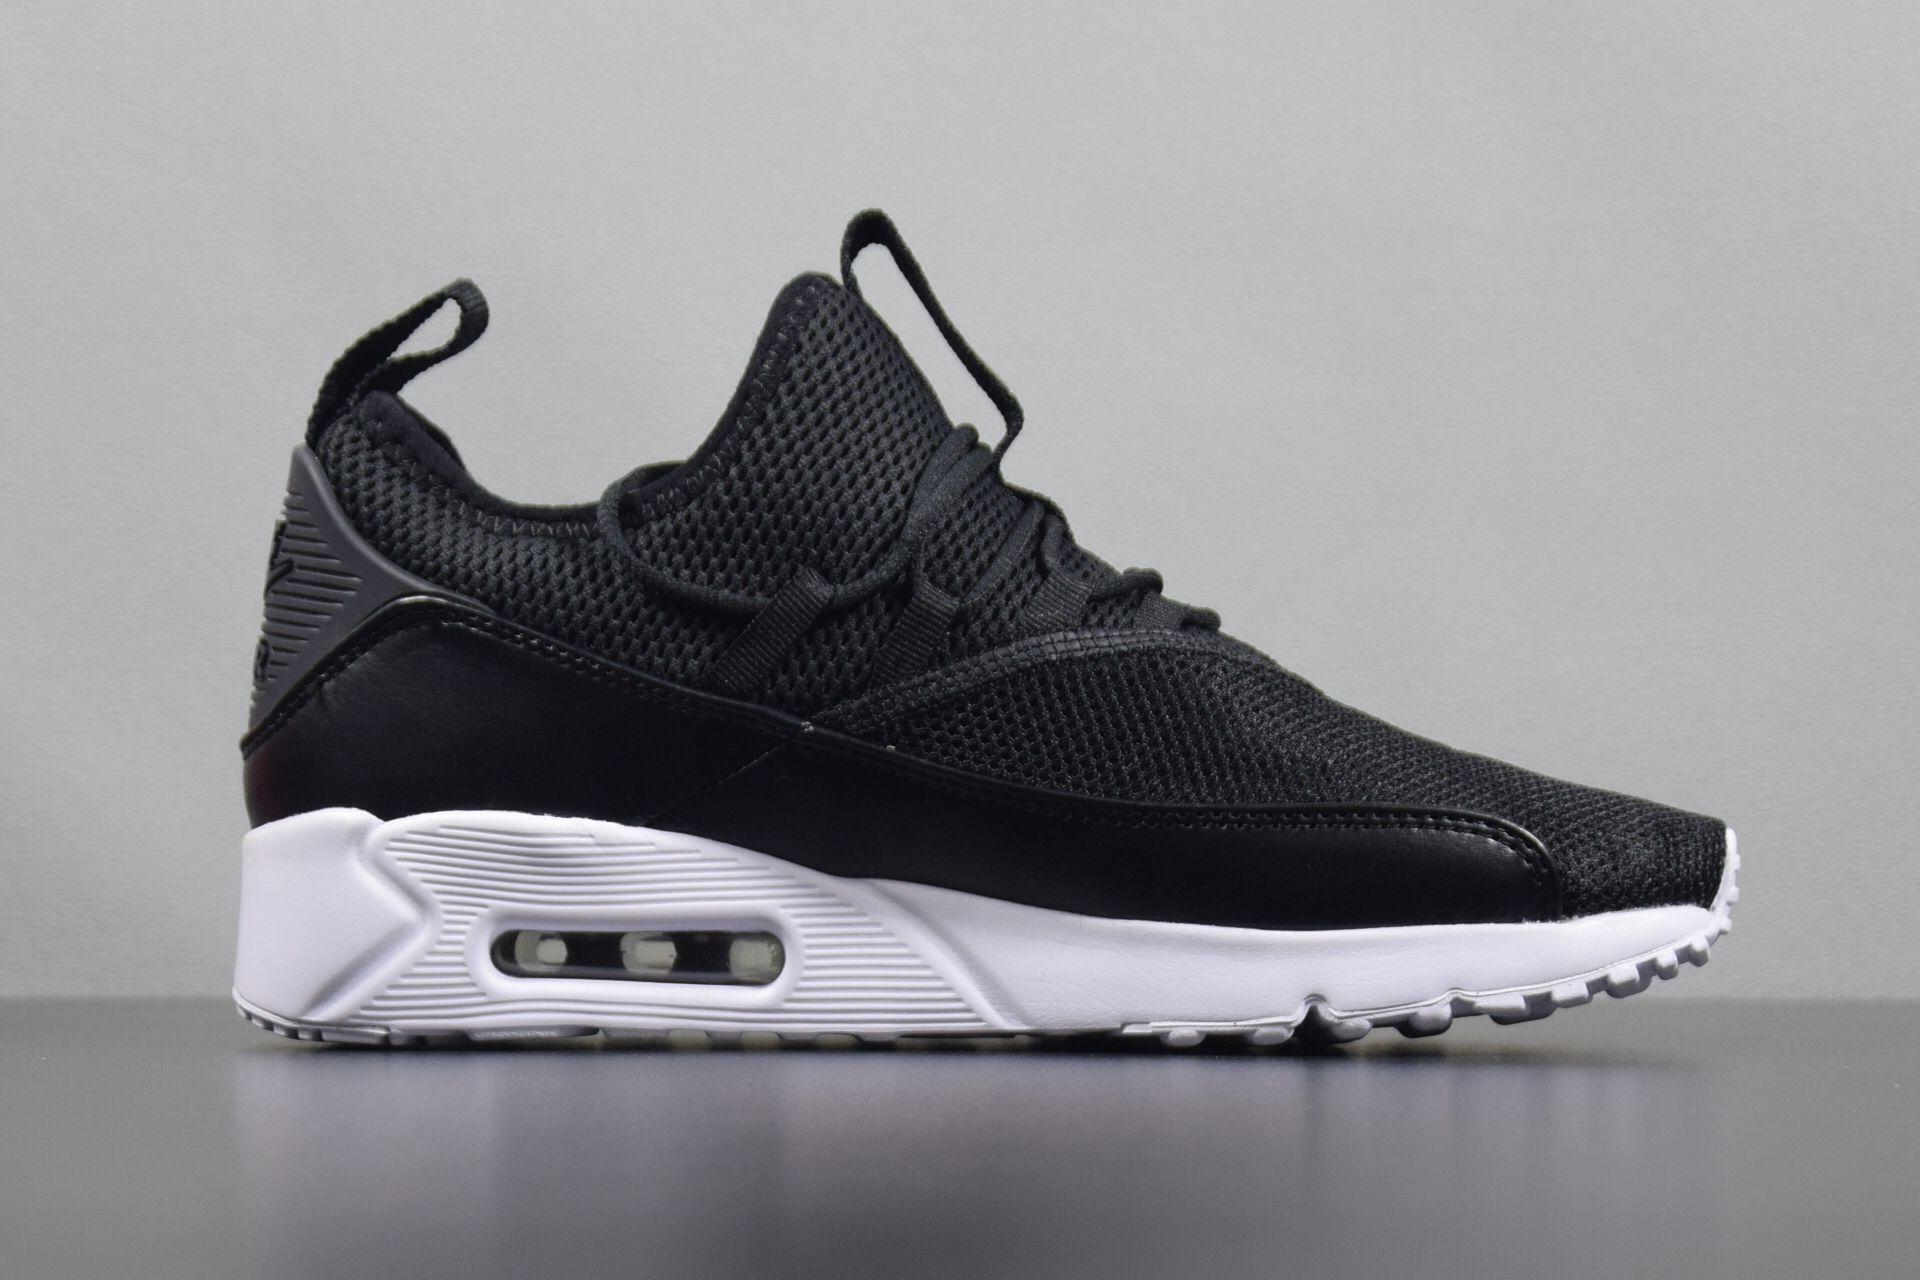 Nike Air Max 90 EZ Black/White Men's Size AO1745-001 | Nike air ...